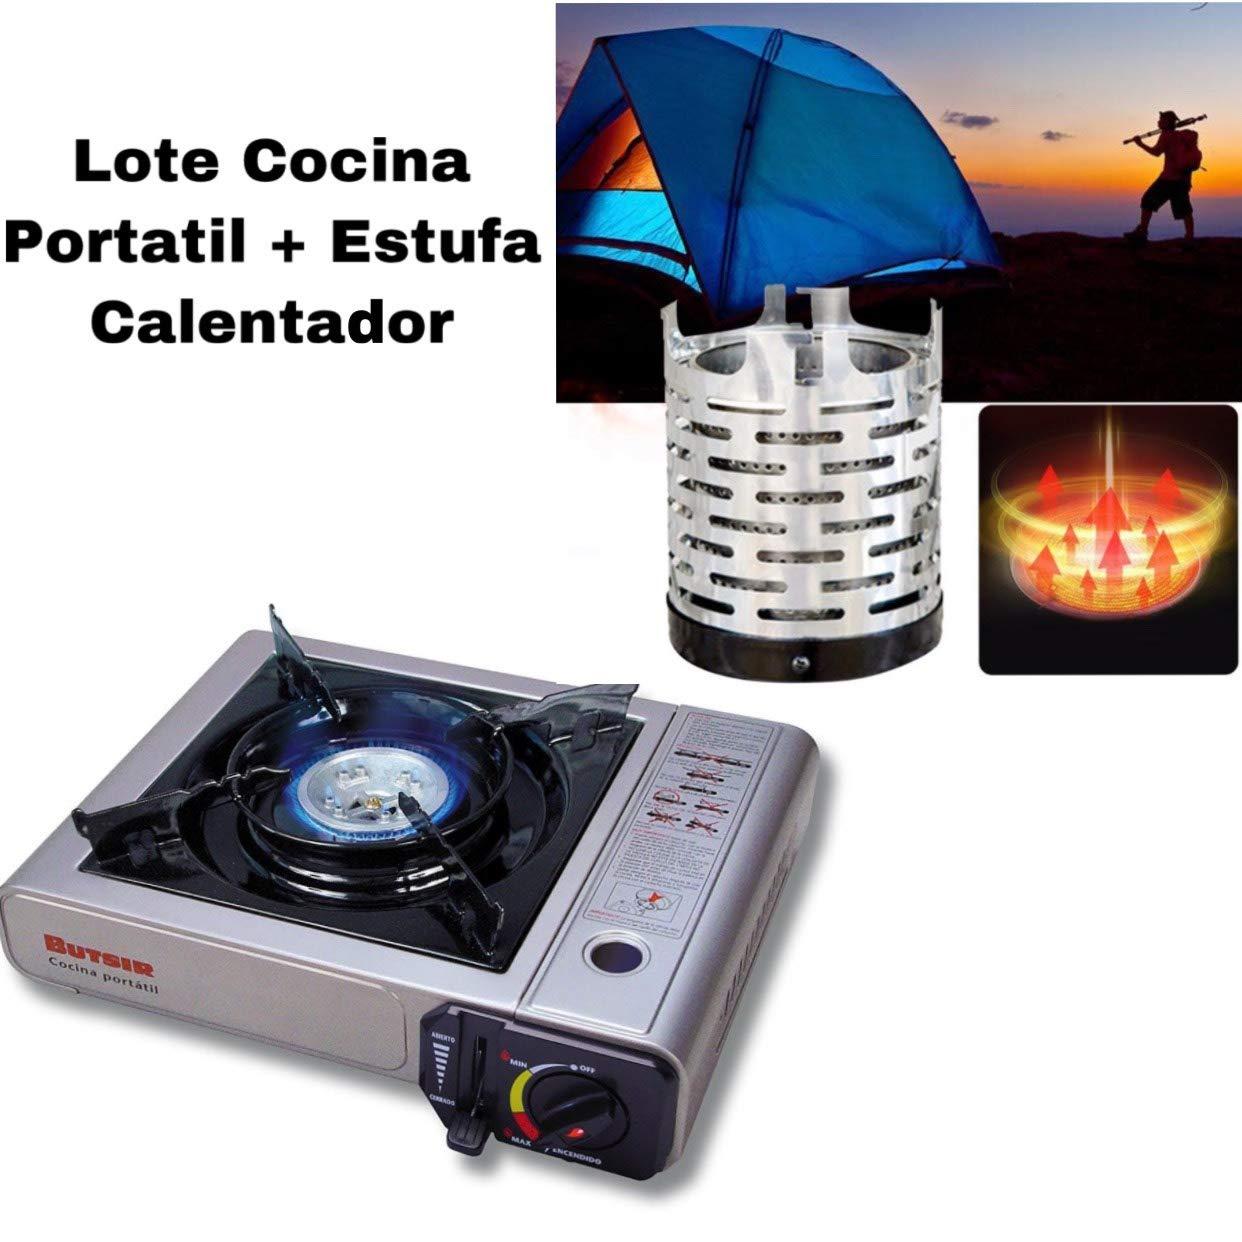 Envio 24h Lote Butsir Cocina MS-1000 + Butsir Calentador Estufa para Cocina Portatil para Camping al Aire Libre, Viajes, Camping, Pesca, Tienda de campaña ...